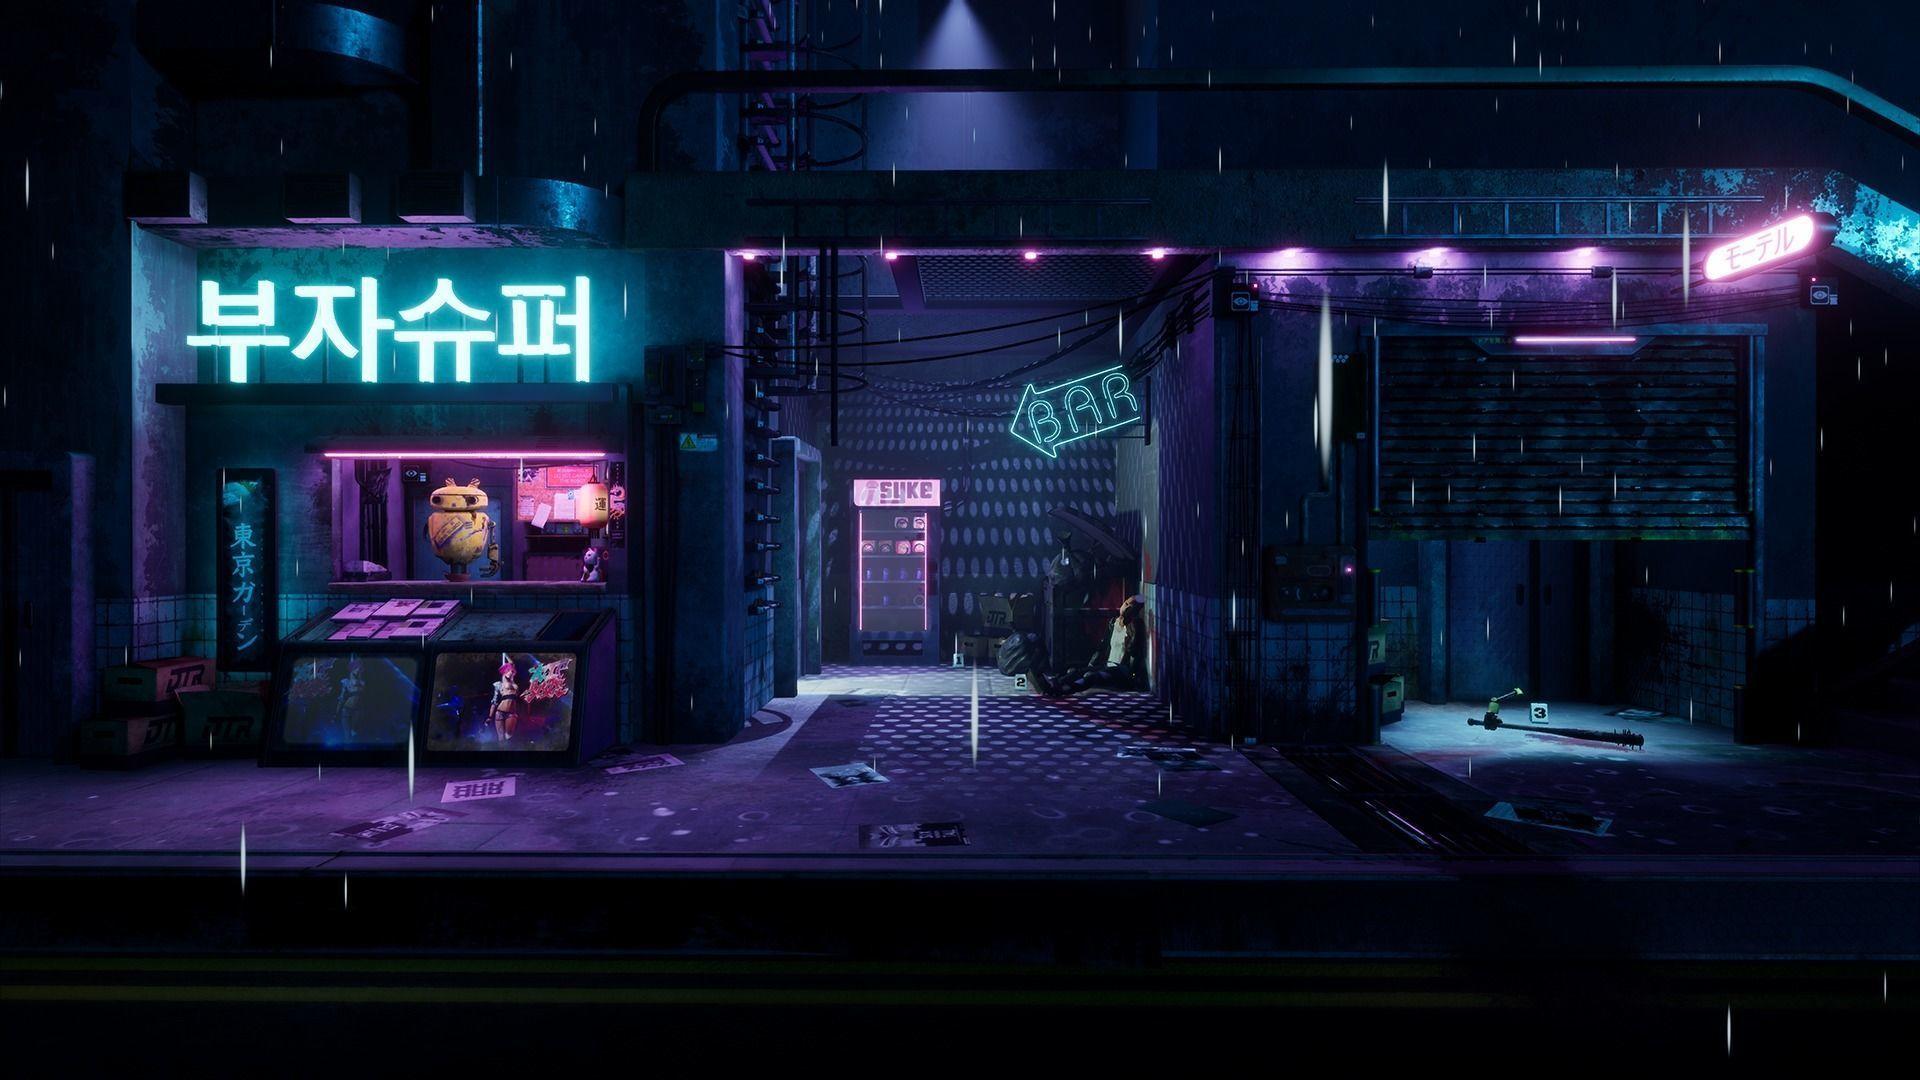 Cyberpunk Grunge Sci-Fi Asset Pack